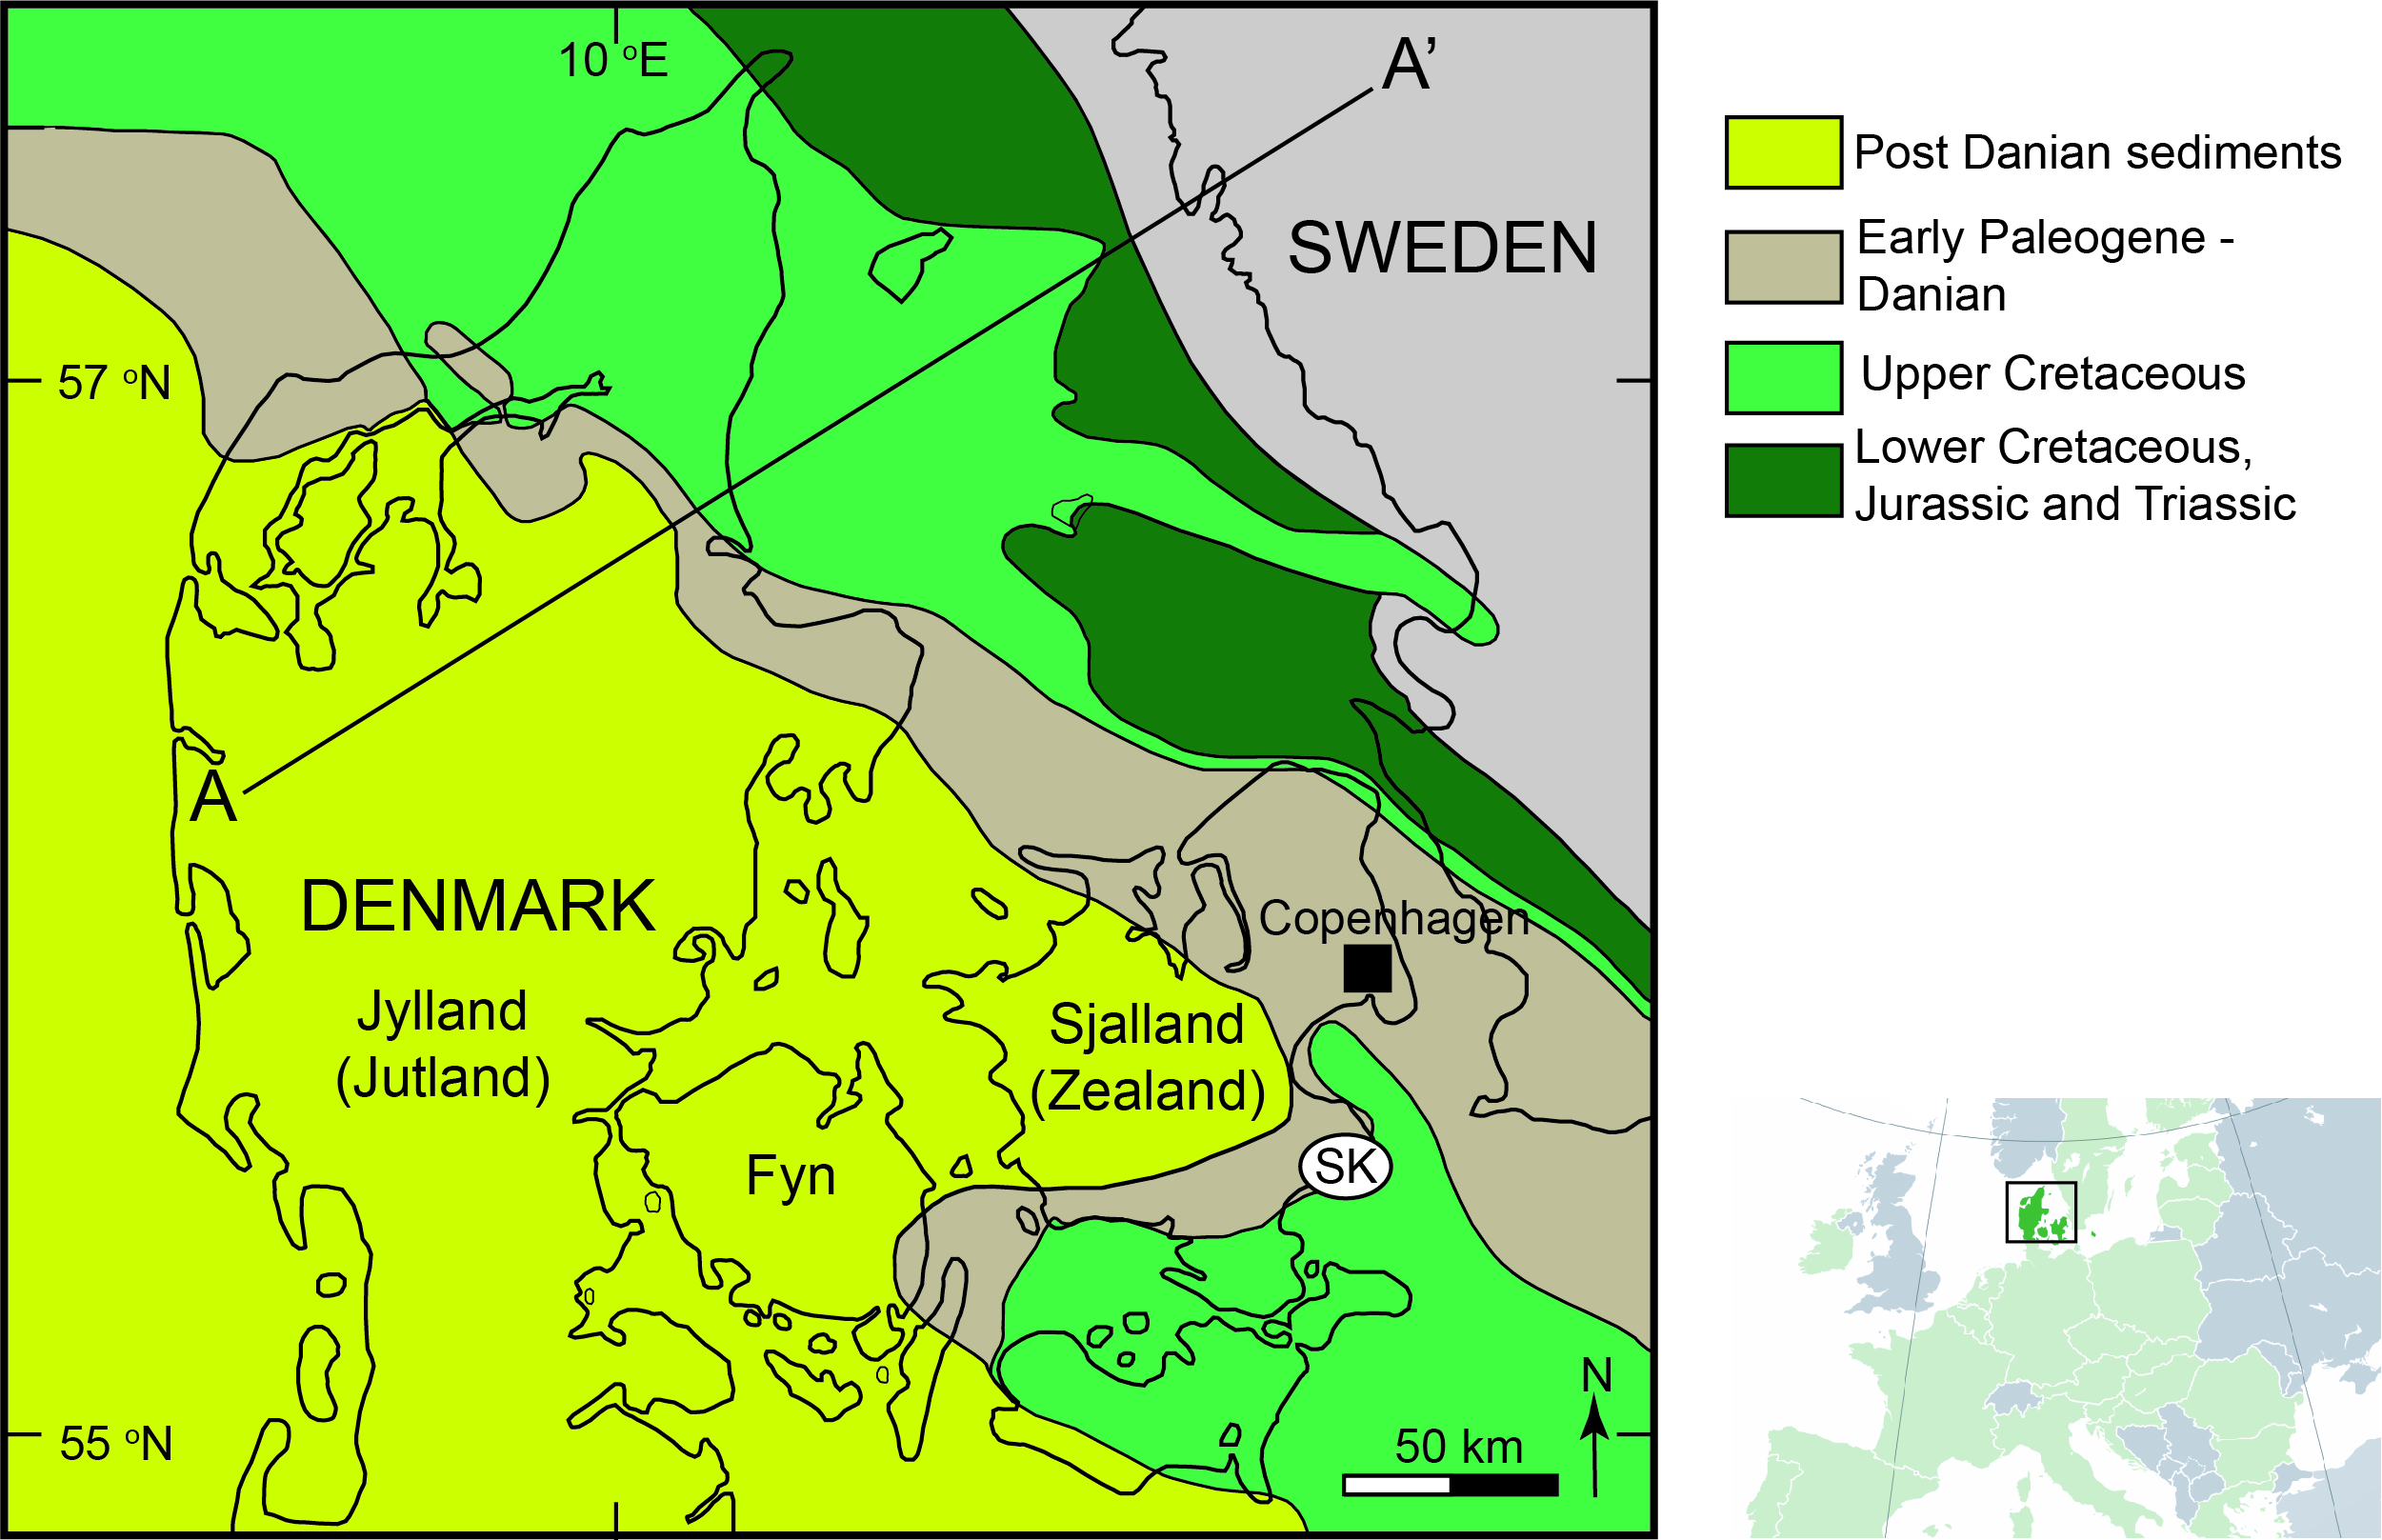 Geologic map of Denmark showing location of Stevns Klint